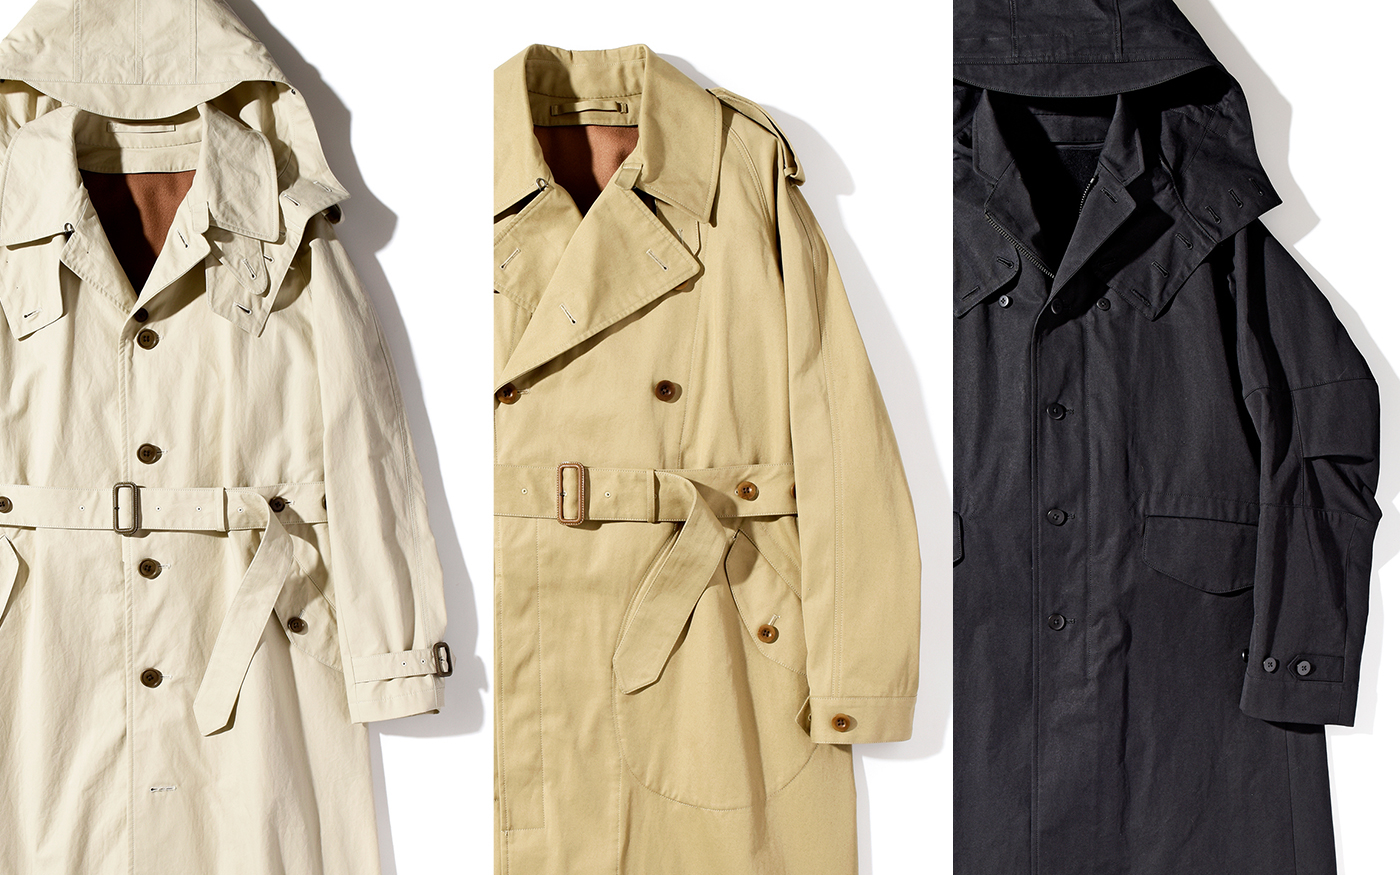 SANYO Style MAGAZINE掲載のお知らせ -SANYO SEWING Designed by TOKITO-